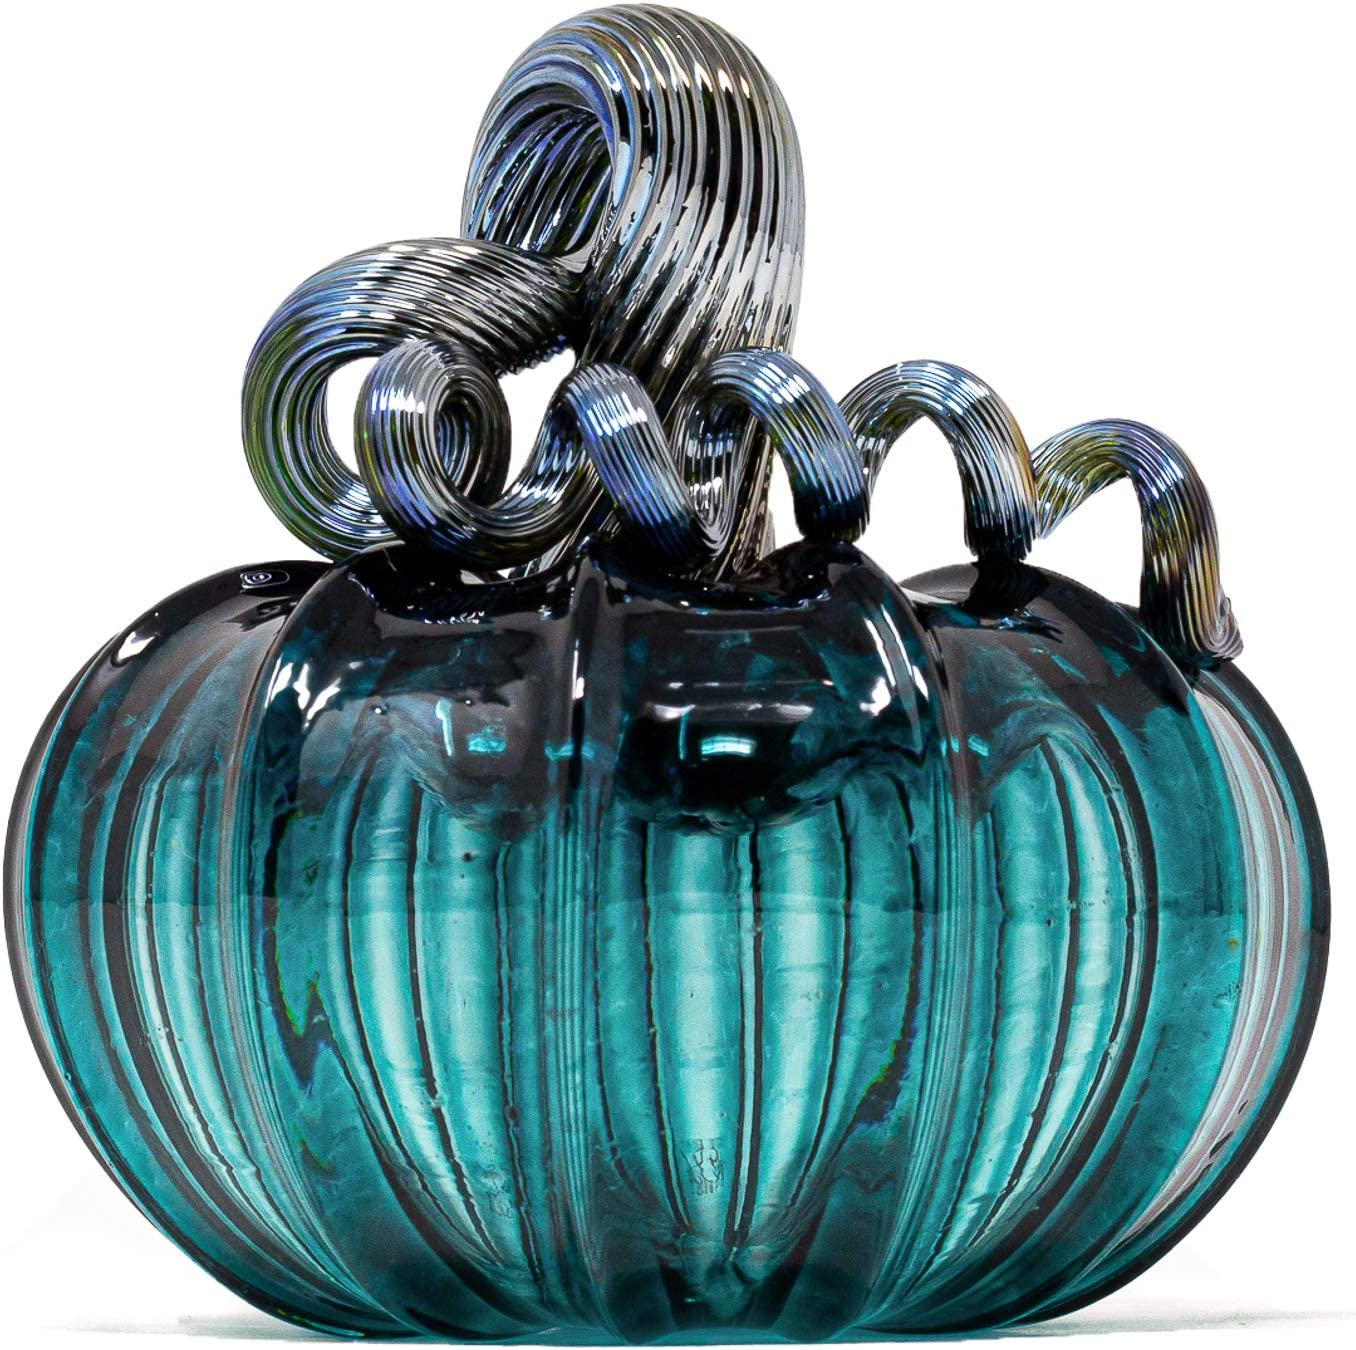 "Luke Adams Glass   3.5"" Mini Glass Pumpkin   Handmade Table Top Home Décor   Outdoor Collectible Sculpture (Lagoon)"